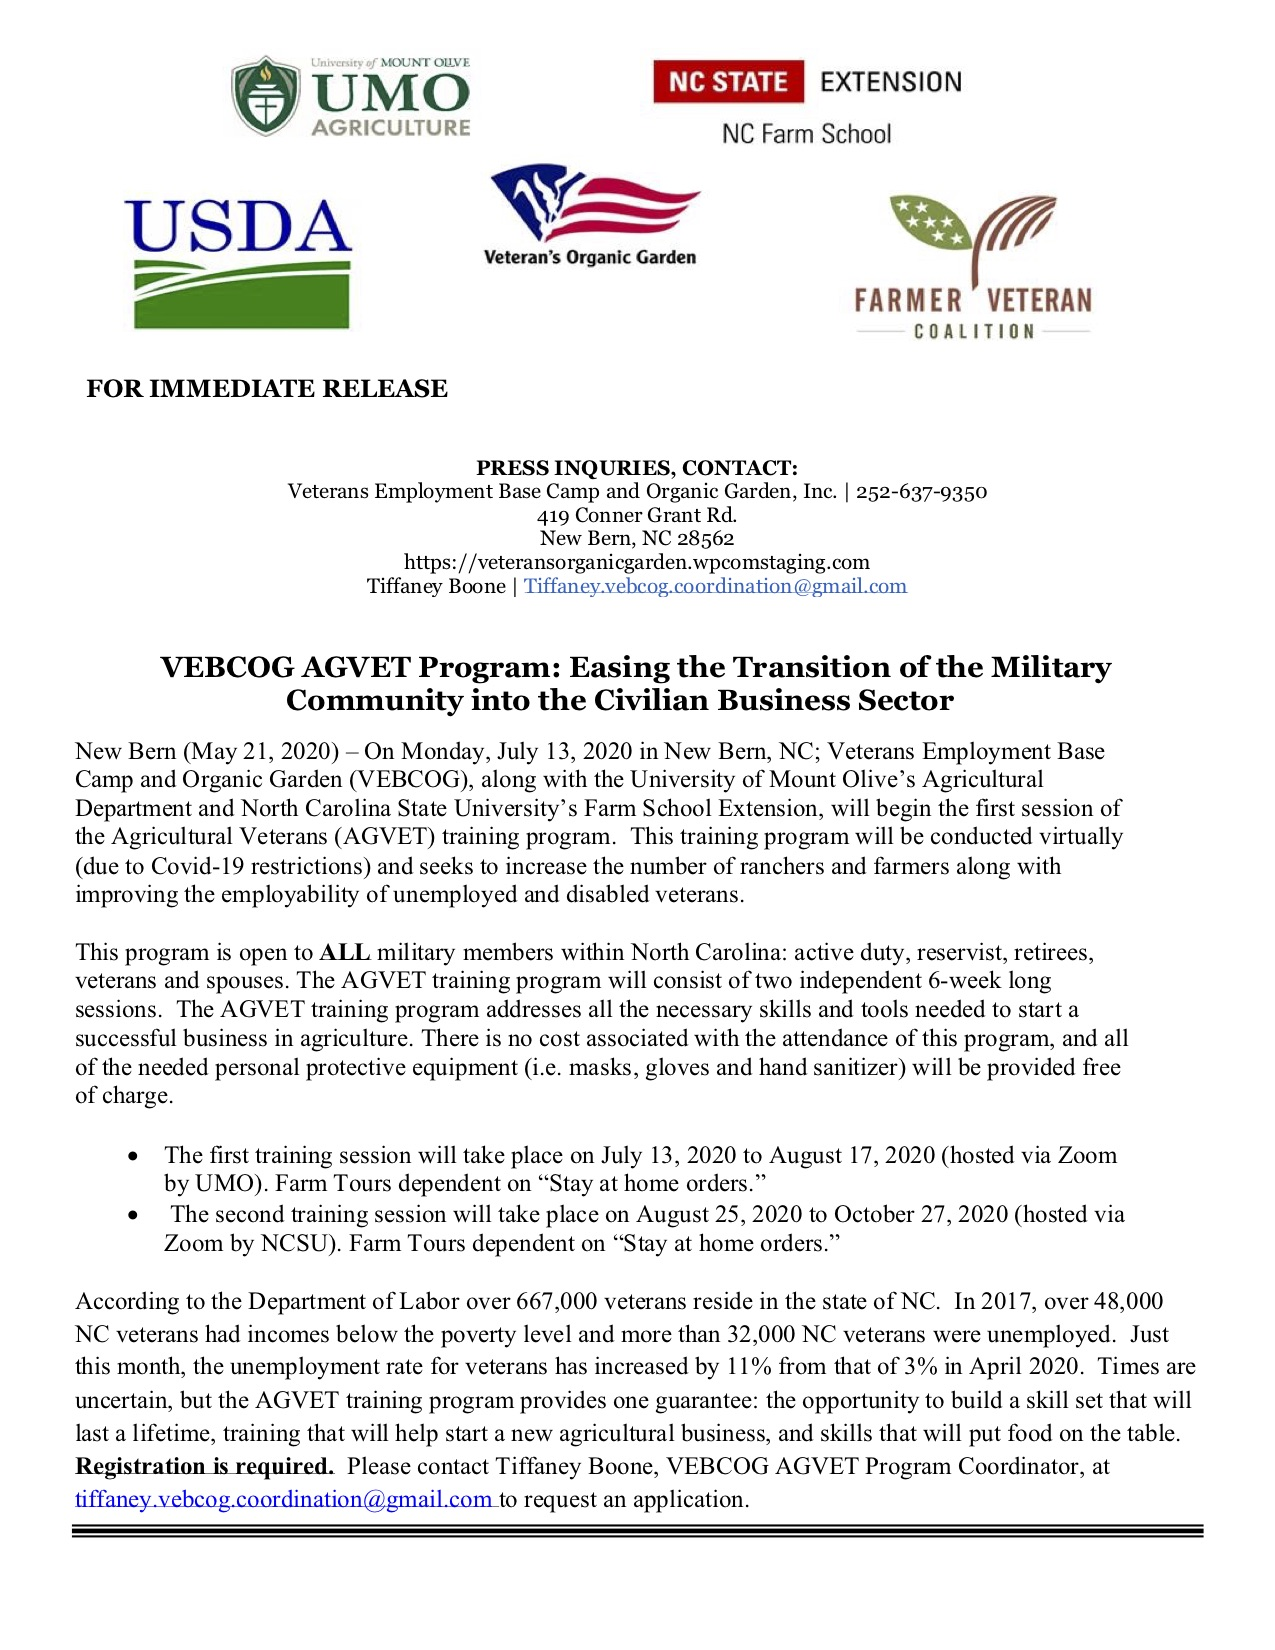 NC Farm School for Veterans Press Release